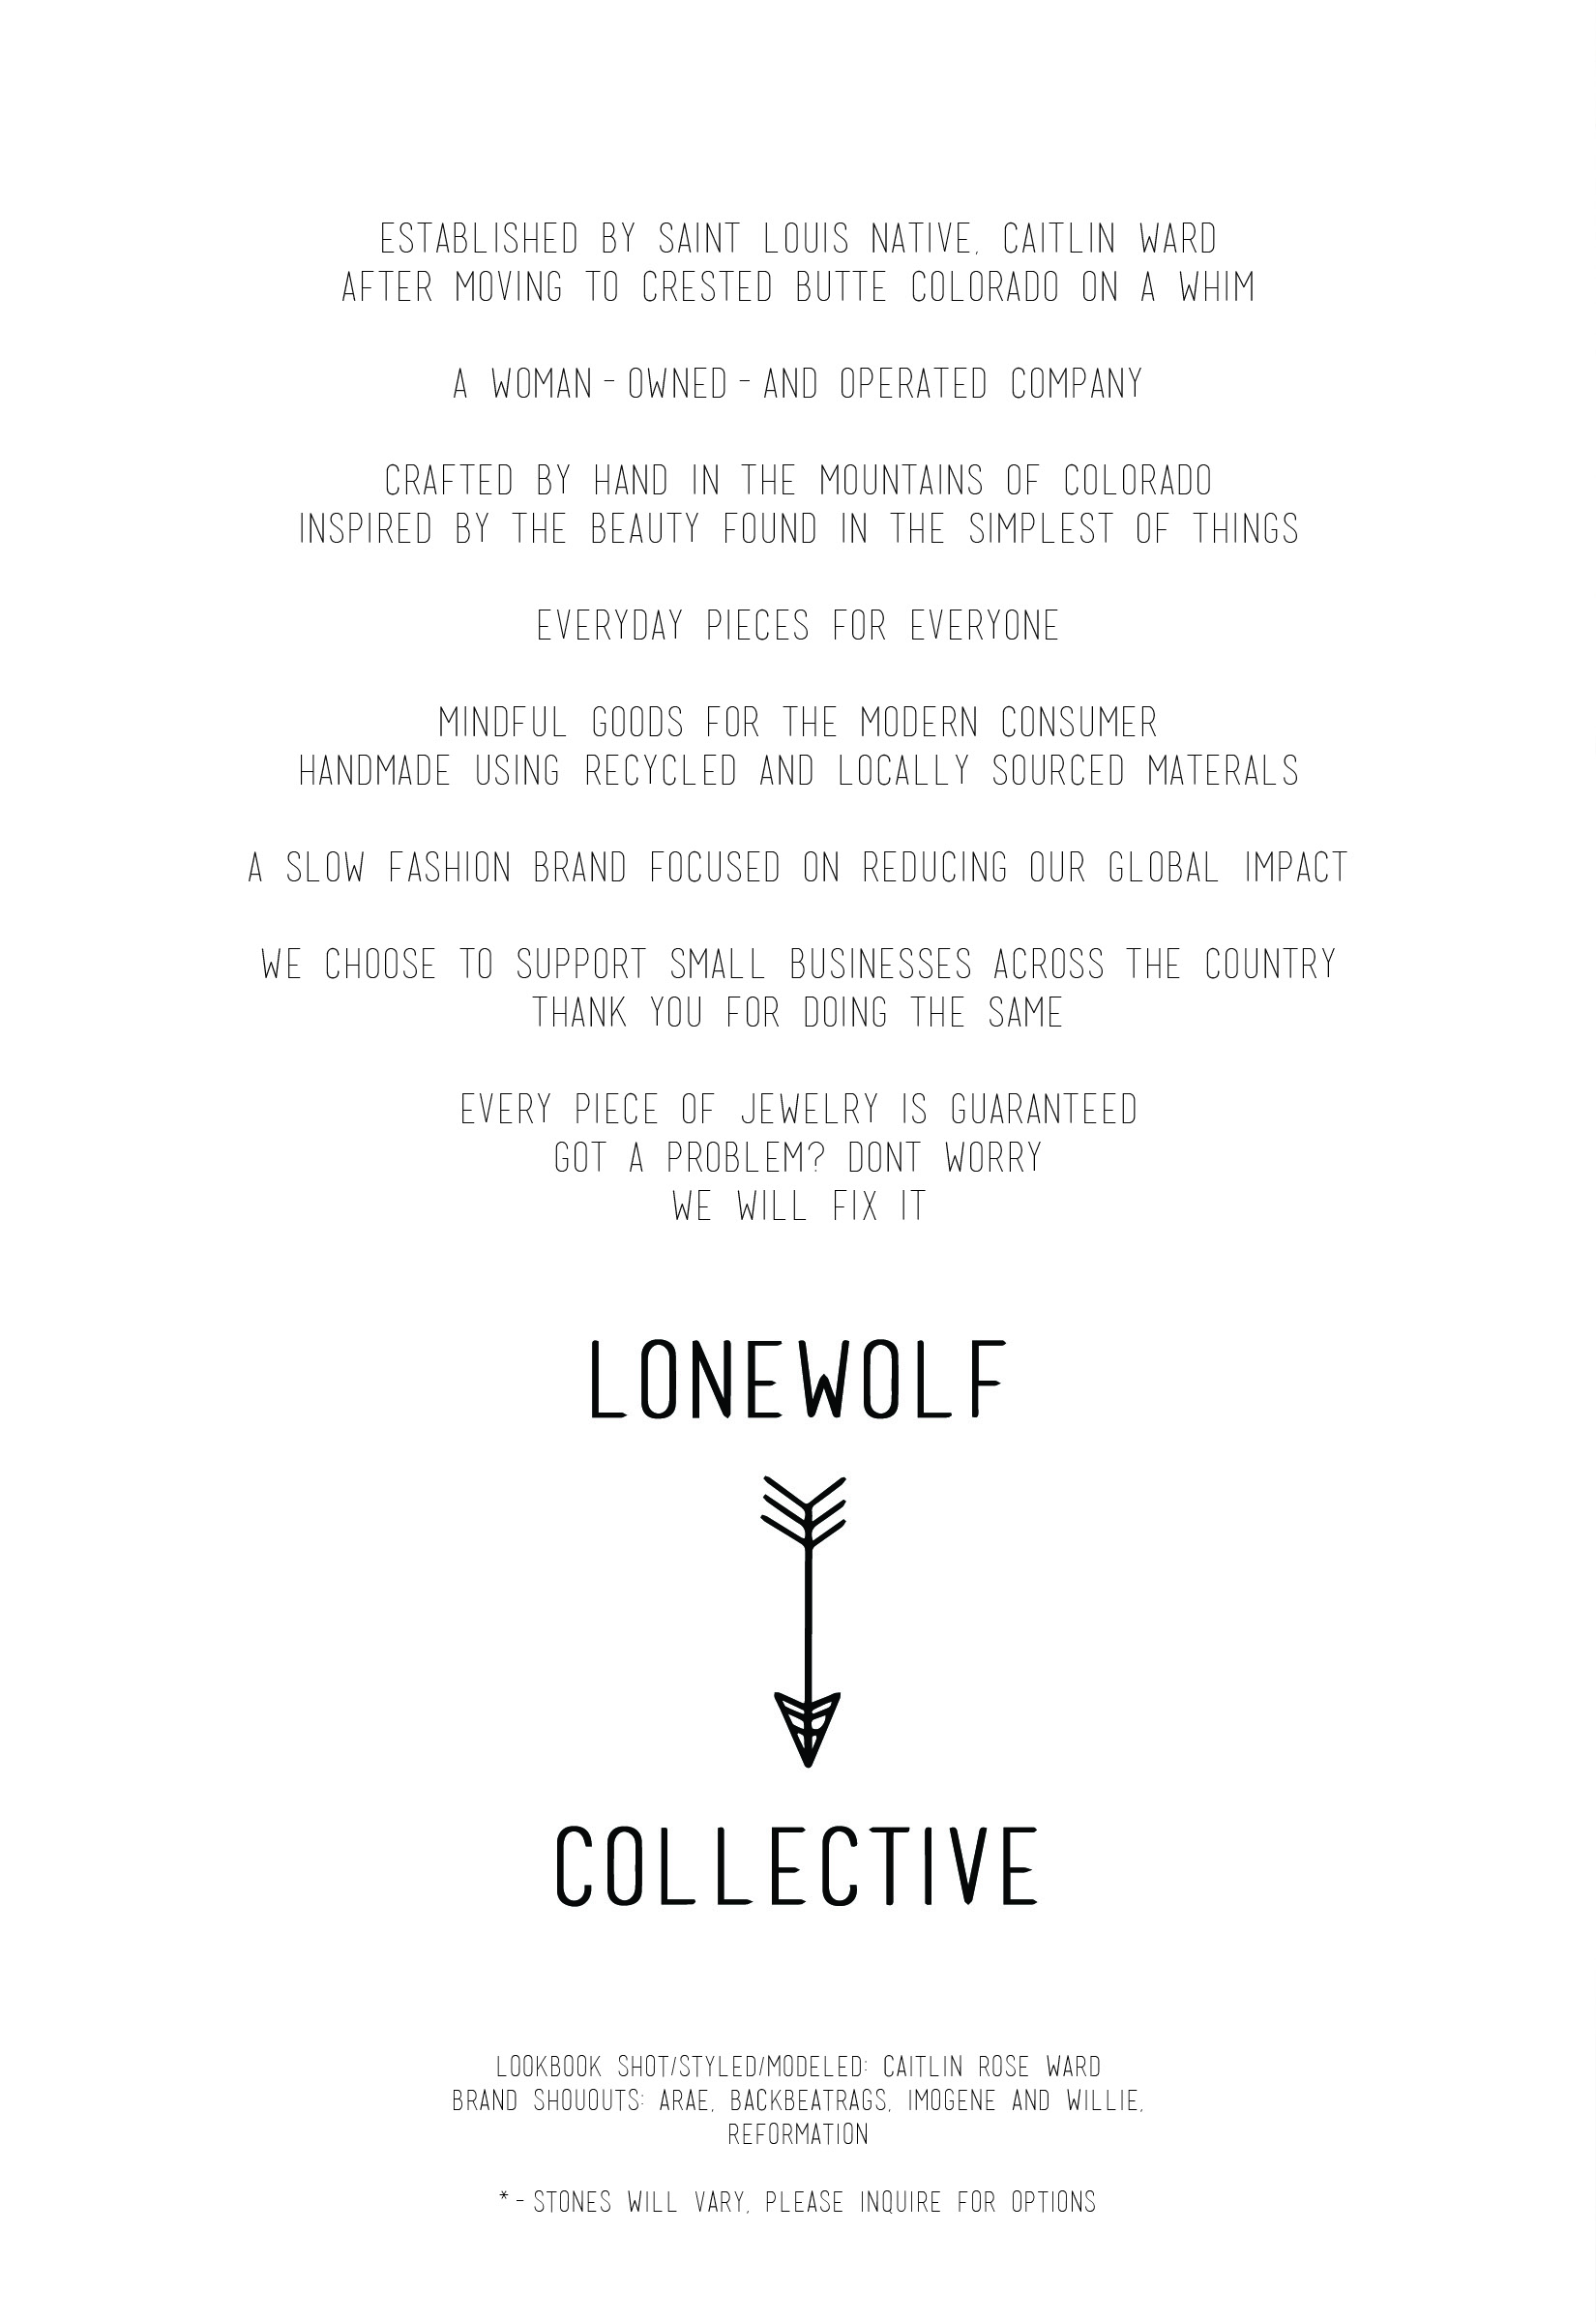 LOOKBOOK — Lonewolf Collective